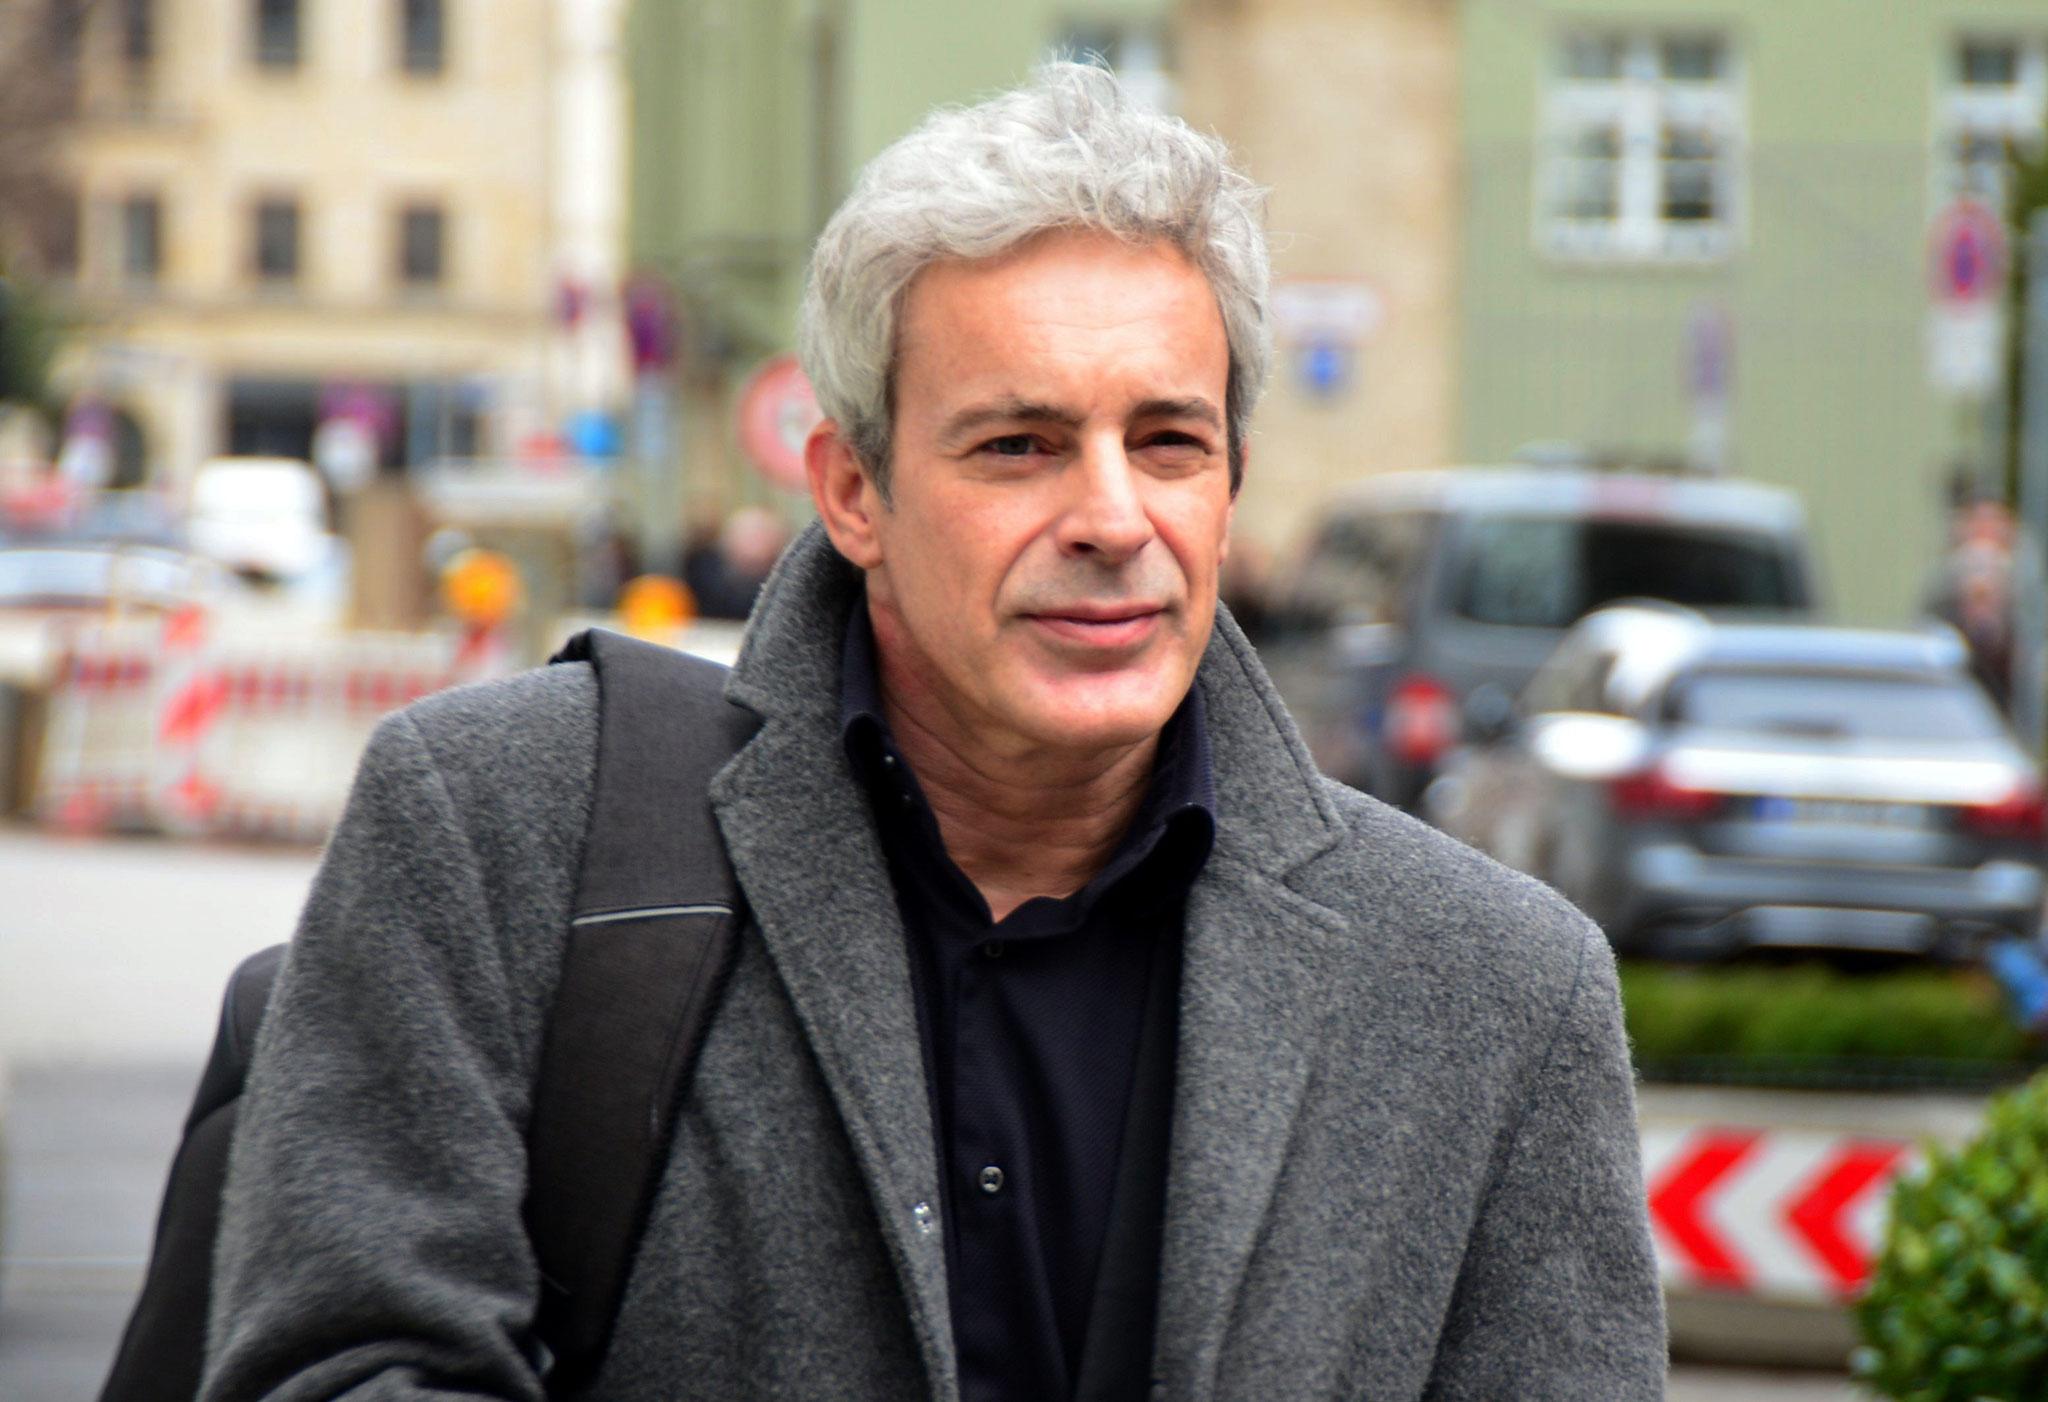 Gedeon Burkhard